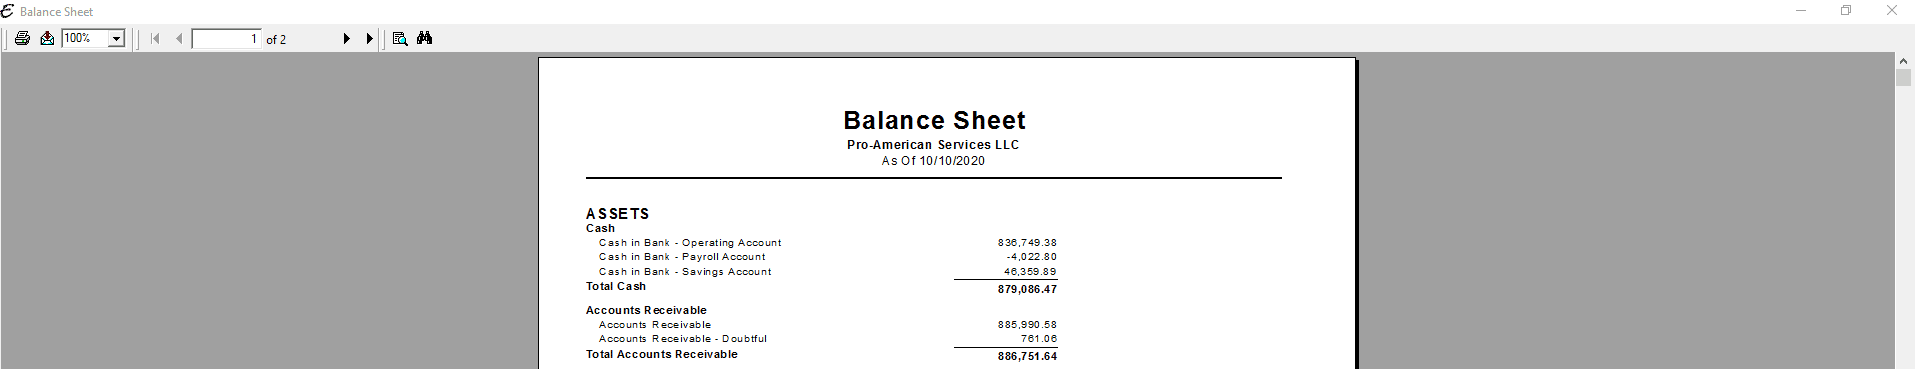 Balance Sheet - PDF